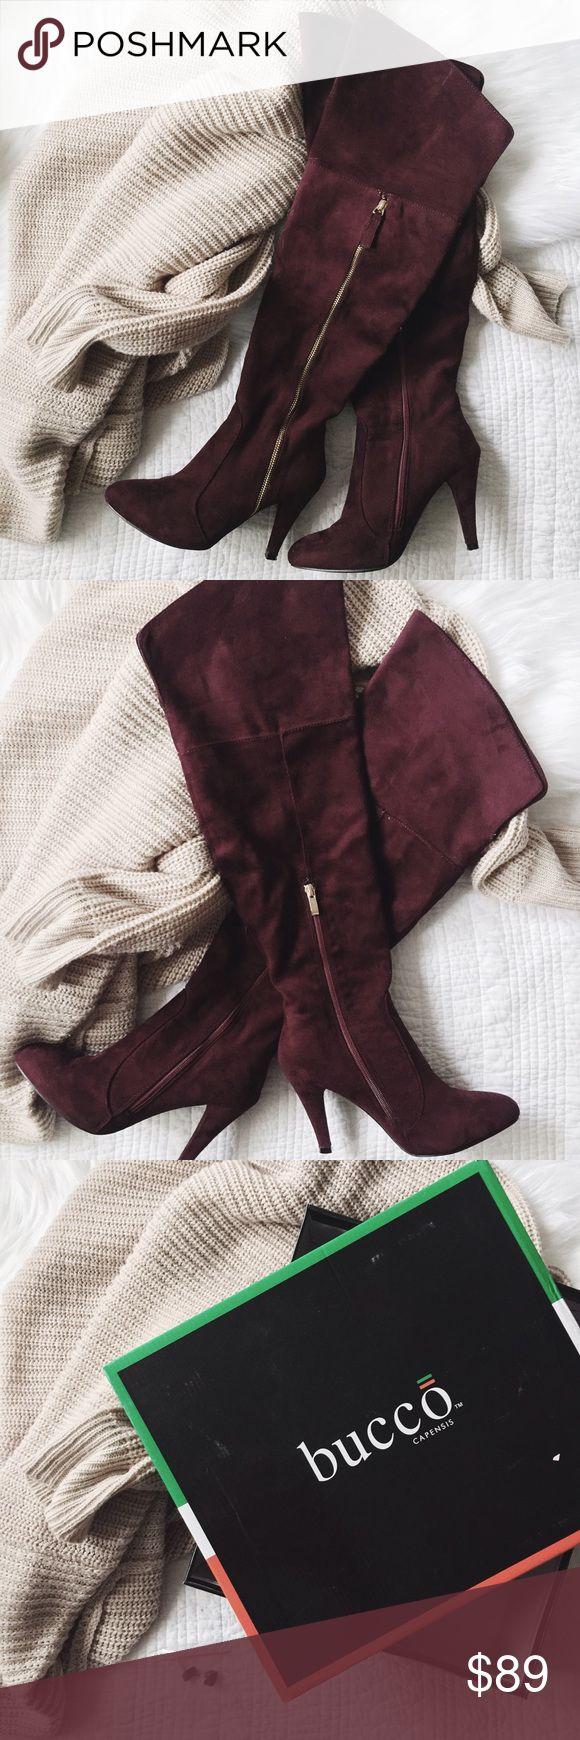 "ʙᴜᴄᴄᴏ ᴋʟᴏᴡᴇ ʙᴏᴏᴛs Suede knee-high pointed toe boots in a gorgeous burgundy color. Boots are true to size & feature a partial side zipper (gold hardware) with a stiletto heel. Lastly, lightly padded footbed and topstitch detail. I have only worn these ONCE. They are looking for a fashionista to give them a new home. They come with their box & replacement studs for the heels.  ‣ᴍᴀɴᴍᴀᴅᴇ ᴜᴘᴘᴇʀ ᴀɴᴅ sᴏʟᴇ ‣sʜᴀғᴛ ʜᴇɪɢʜᴛ: ᴀᴘᴘʀᴏx. 17"" ‣ᴏᴘᴇɴɪɴɢ ᴄɪʀᴄᴜᴍғᴇʀᴇɴᴄᴇ: ᴀᴘᴘʀᴏx. 14"" ‣ʜᴇᴇʟ ʜᴇɪɢʜᴛ: ᴀᴘᴘʀᴏx. 4"" bucco…"